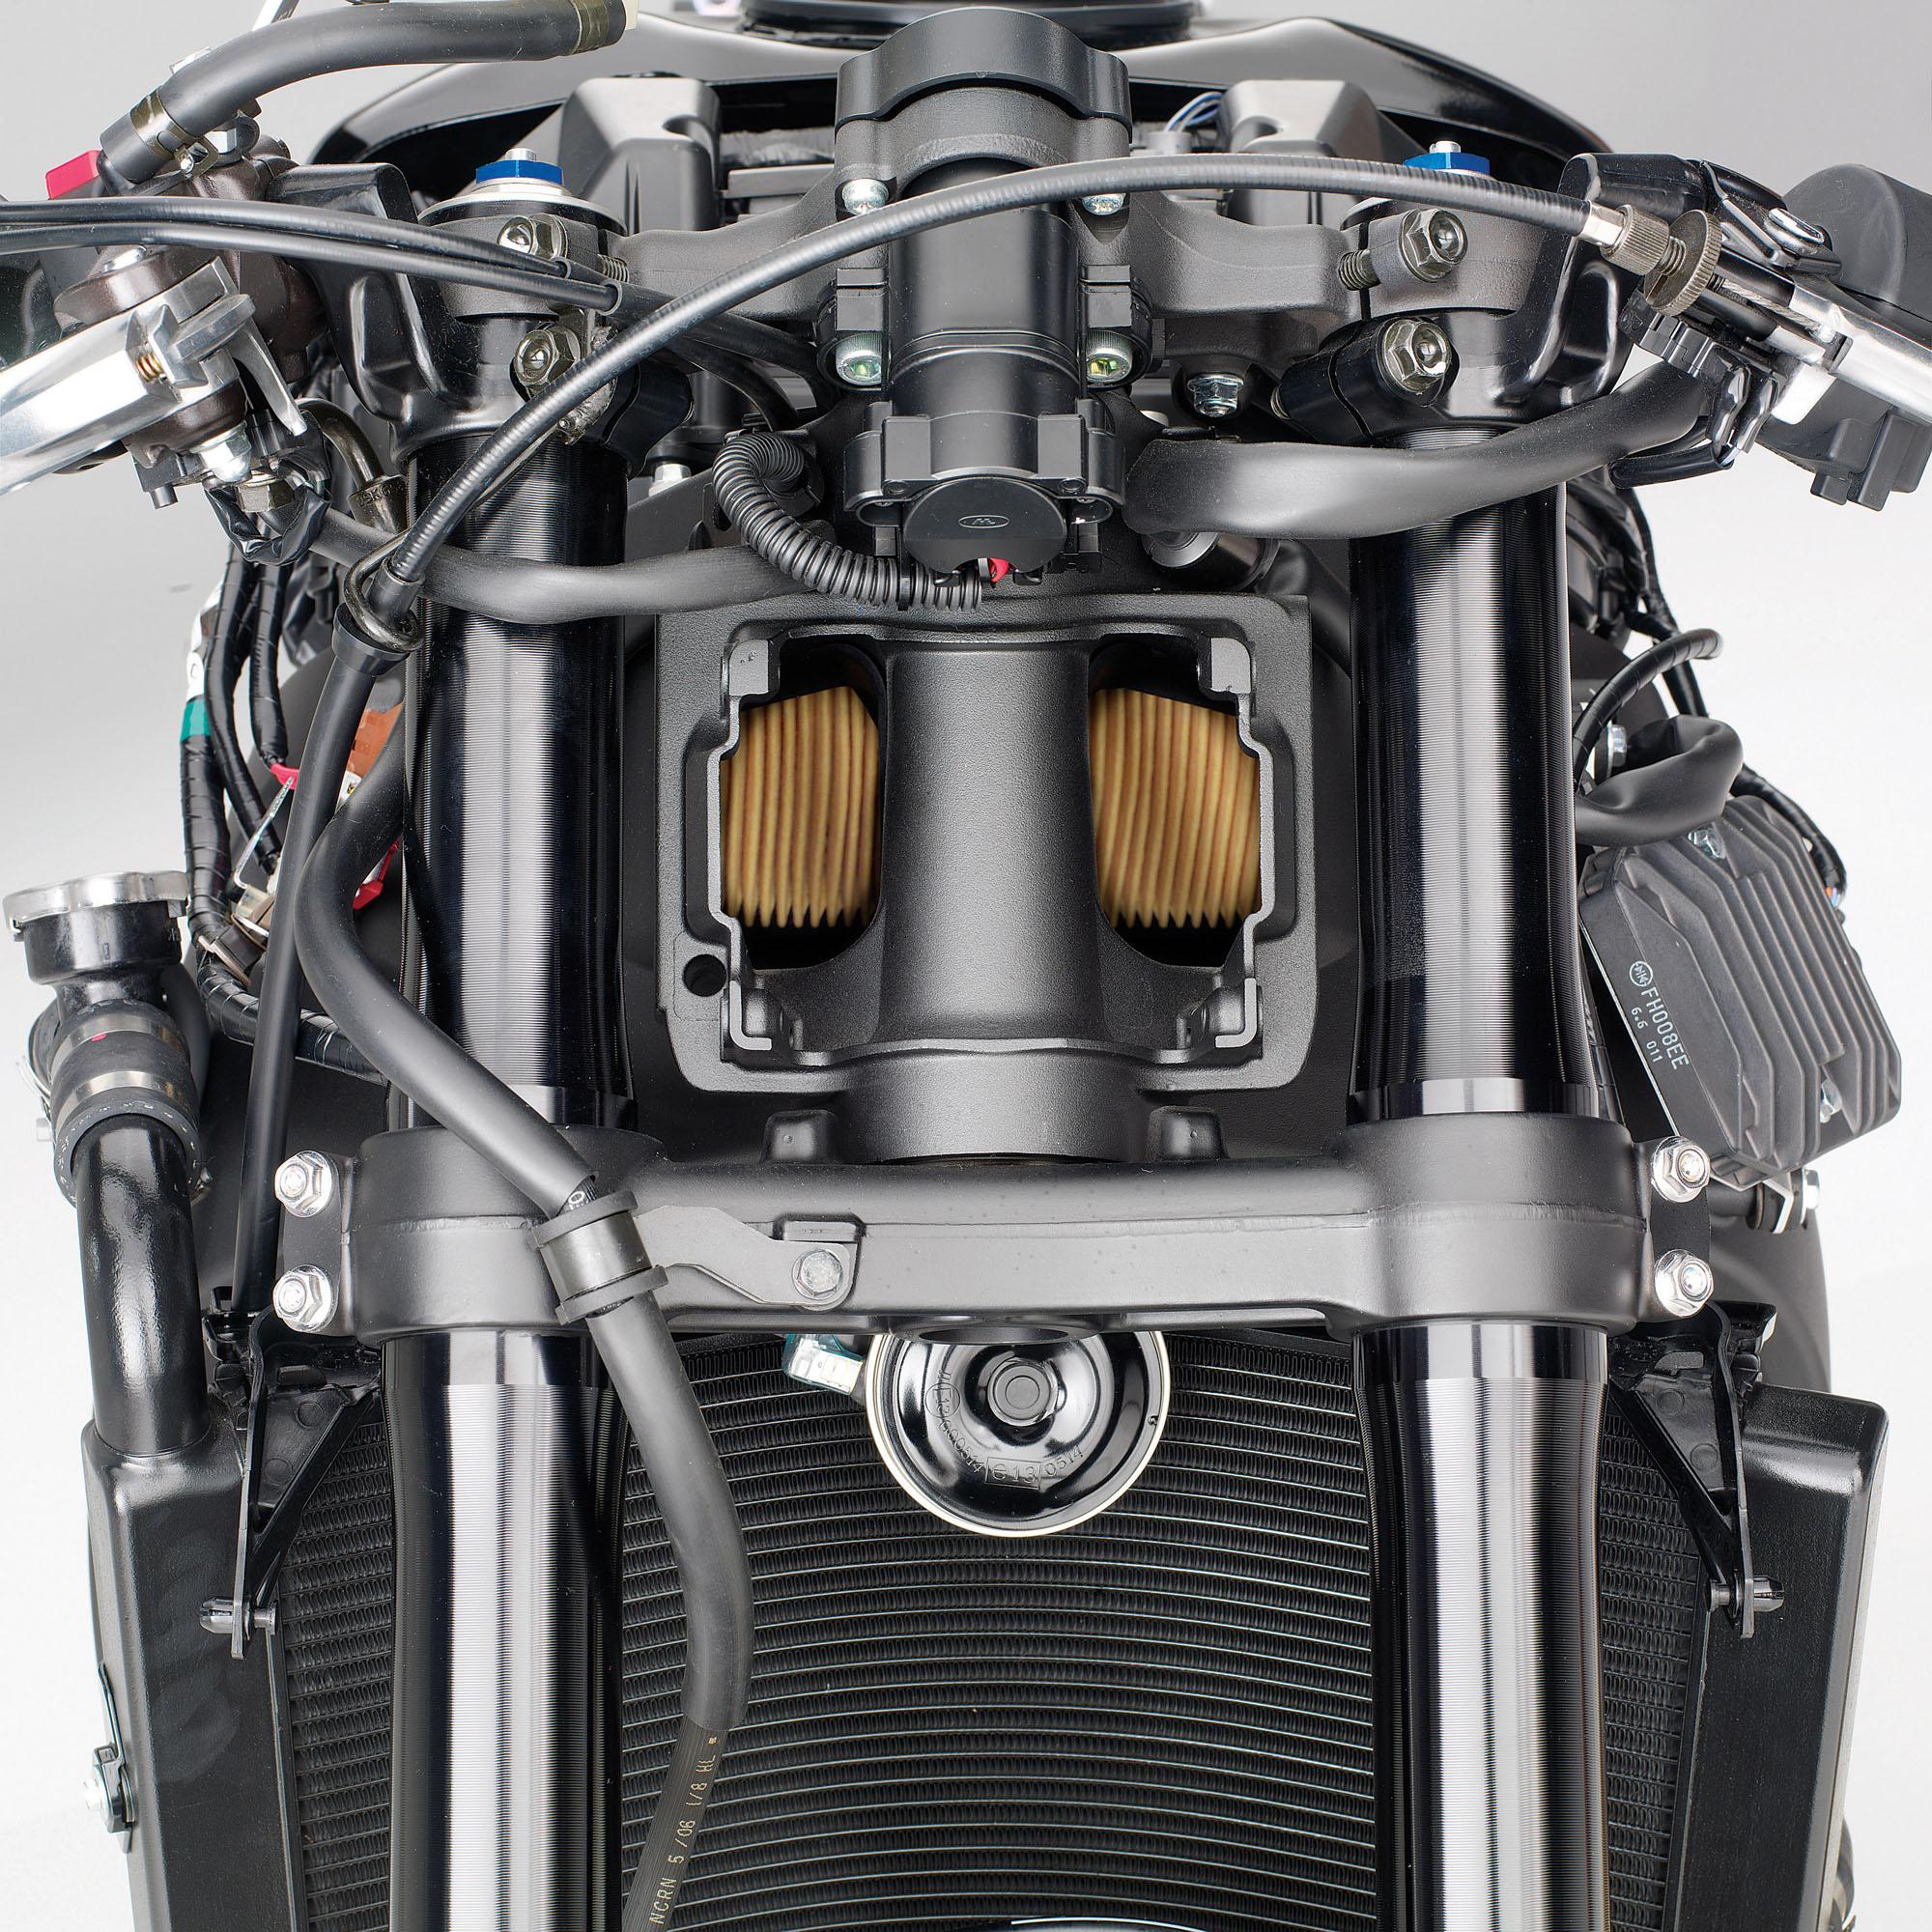 hight resolution of 2017 honda cbr600rr review specs cbr 600 sport bike motorcycle hp tq